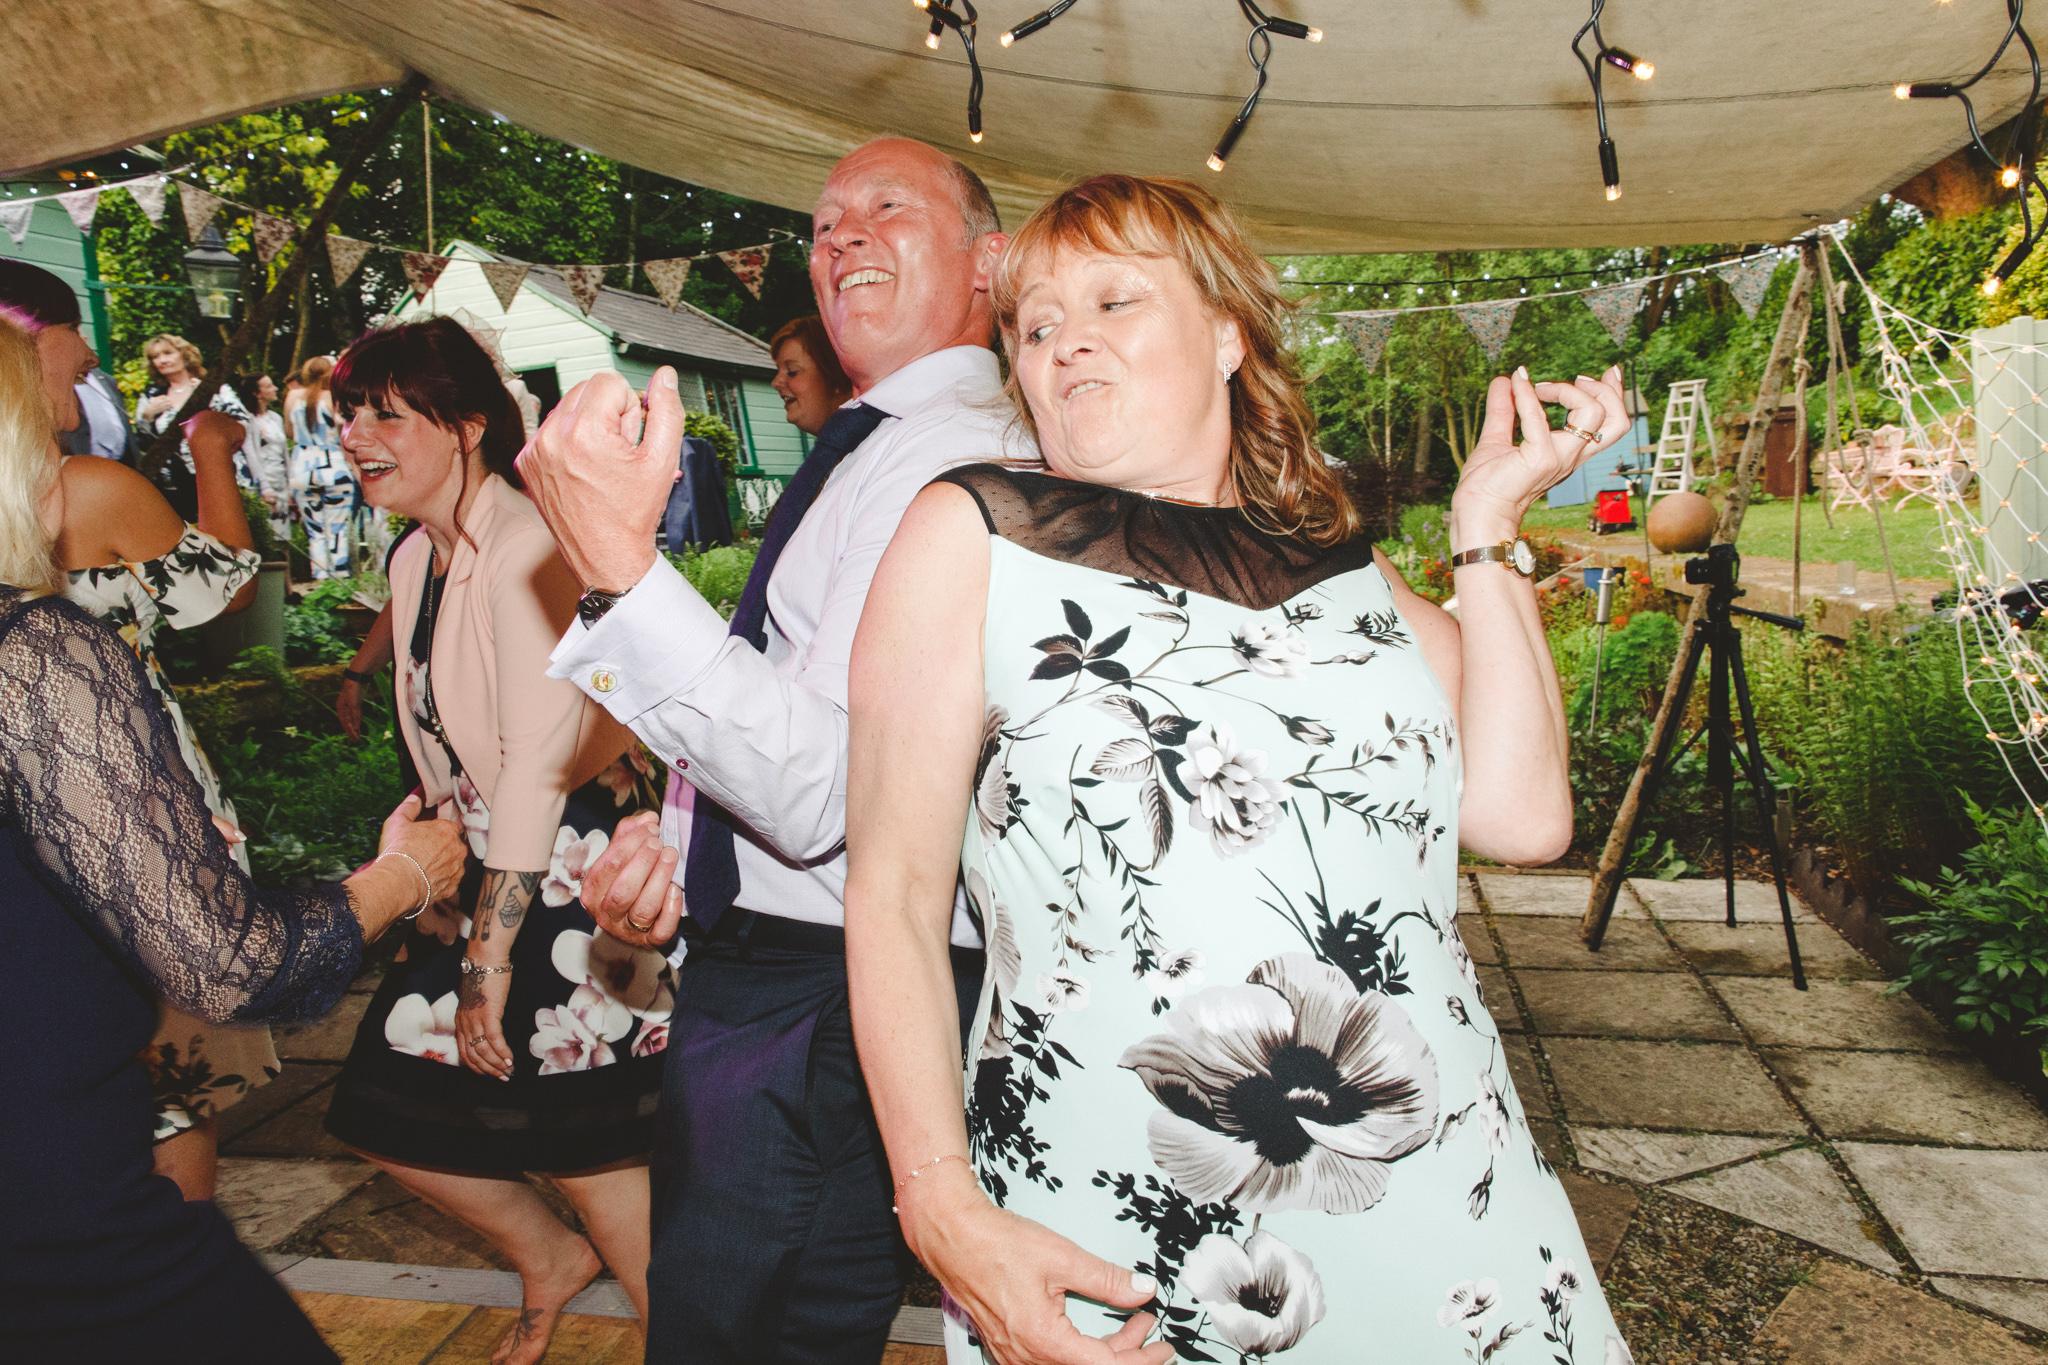 derbyshire-wedding-photographer-videographer-camera-hannah-65.jpg